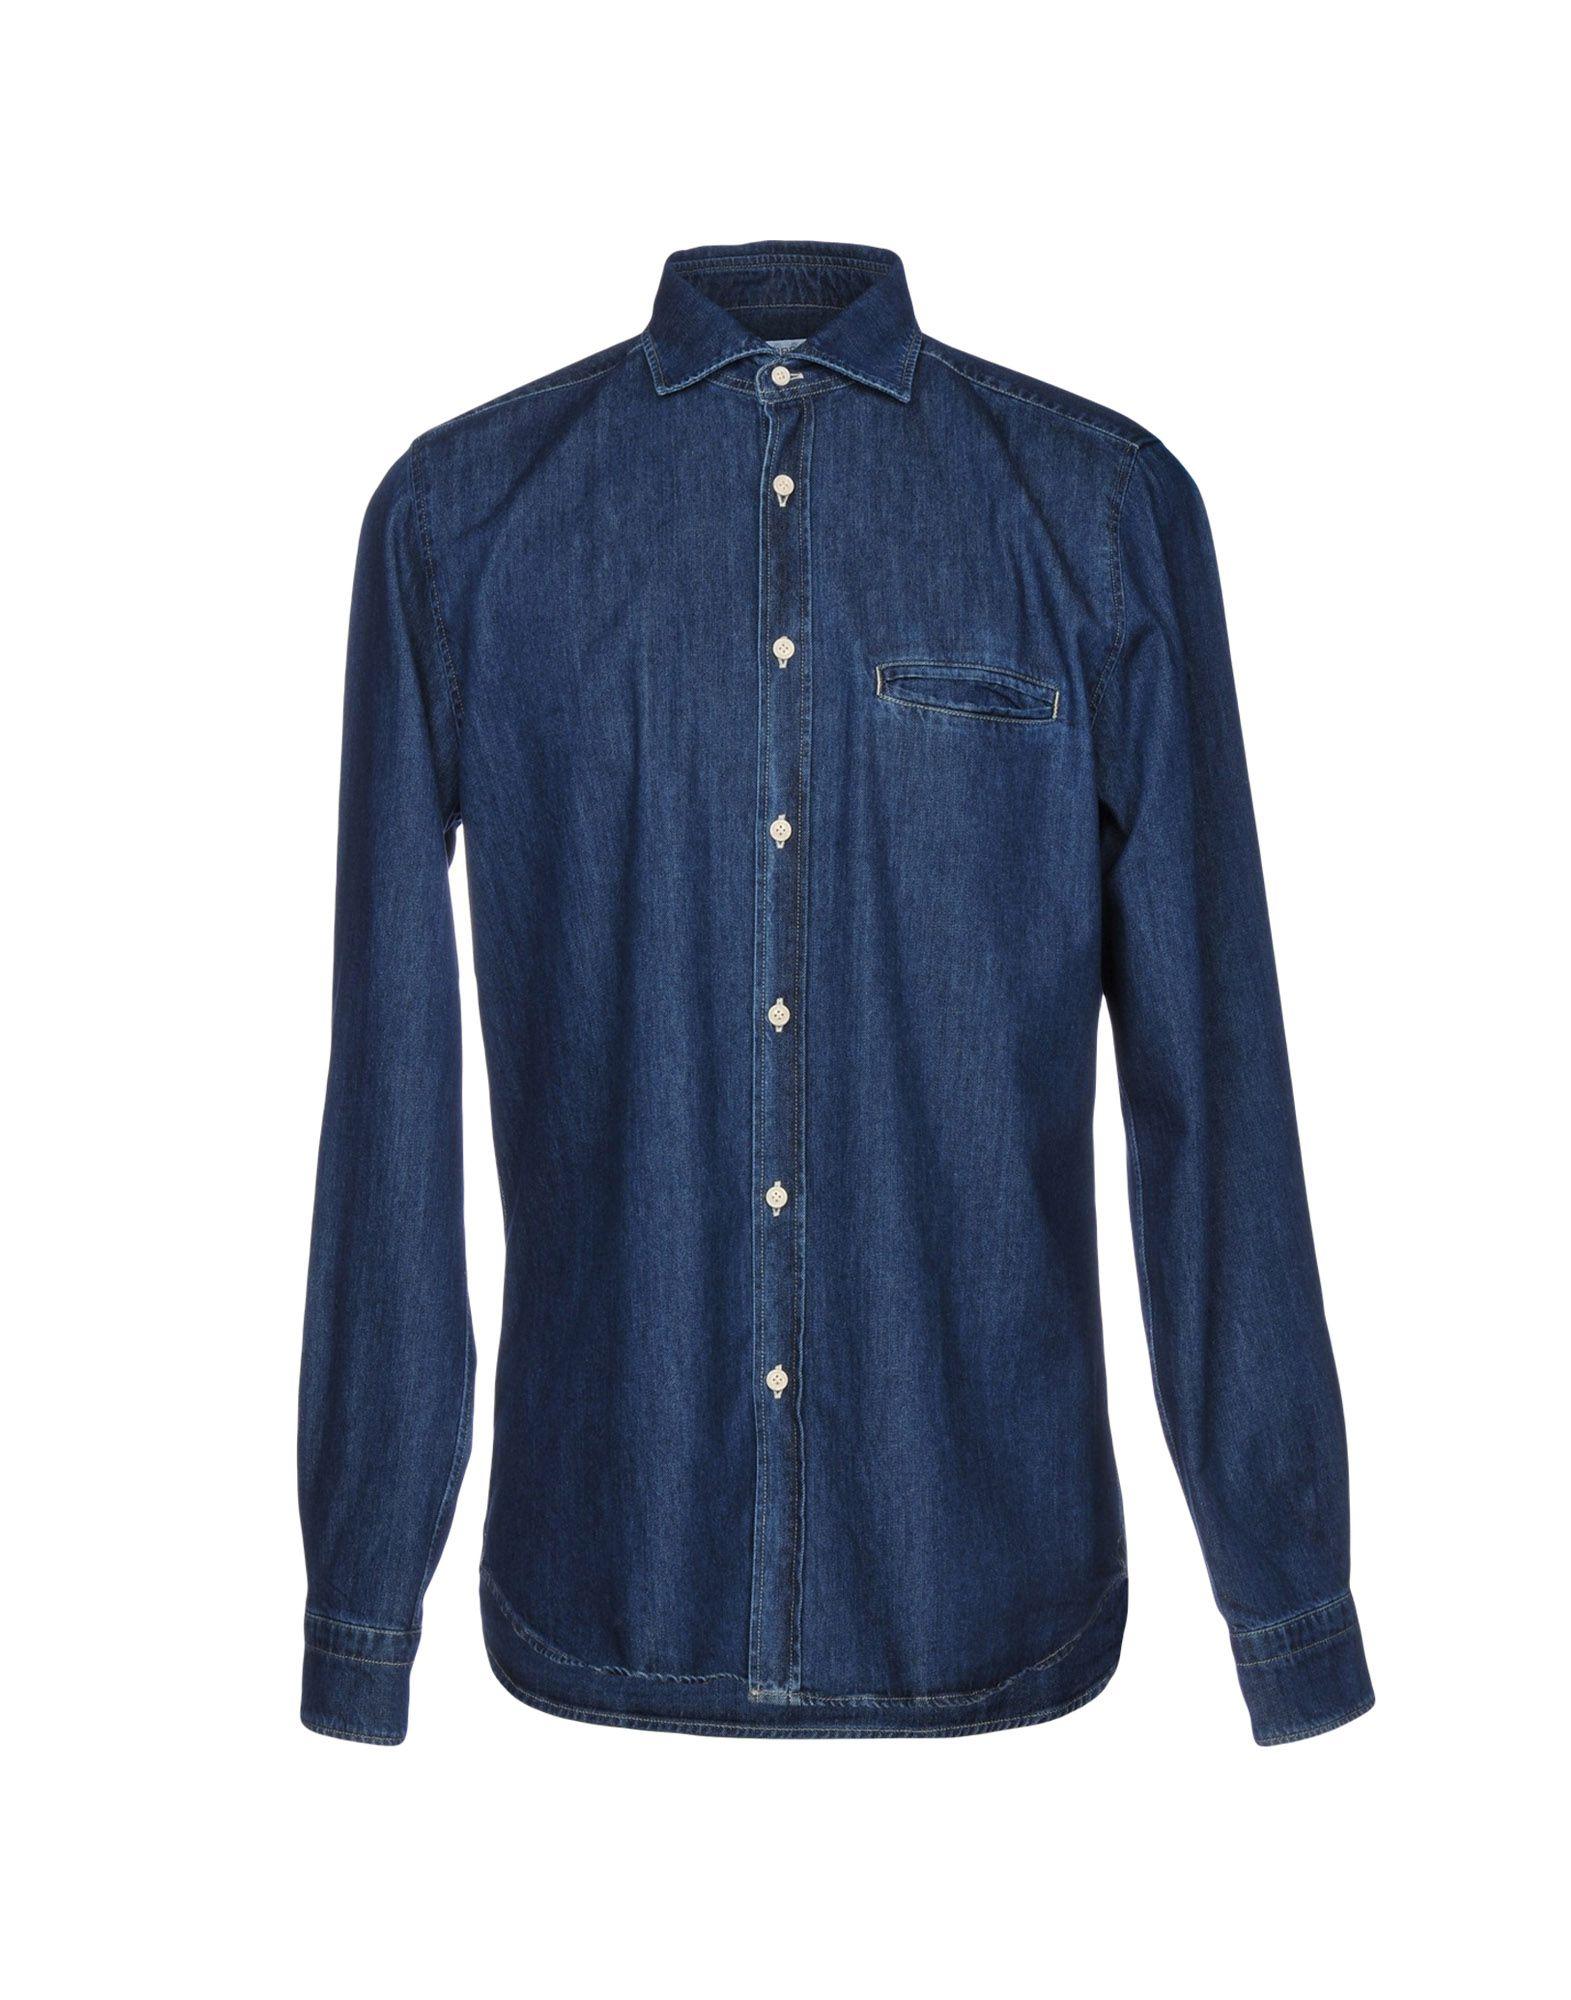 BORSA Denim Shirt in Blue